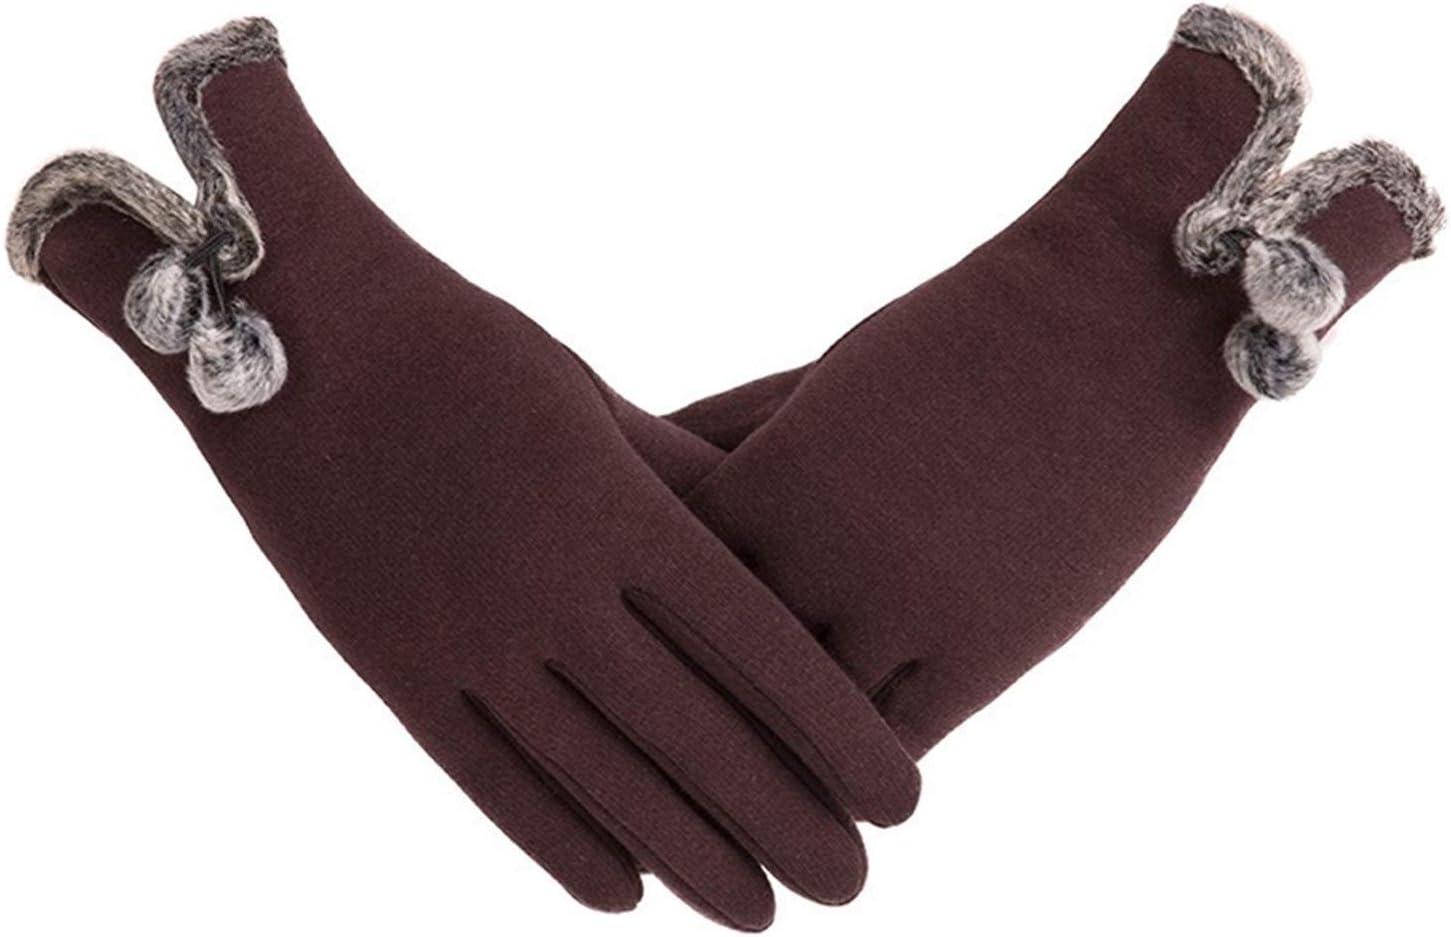 JBIVWW Female Autumn Winter Non-Inverted Cashmere Full Finger Warm Lace Gloves Women Cotton Touch Screen Gloves (Color : E Brown)